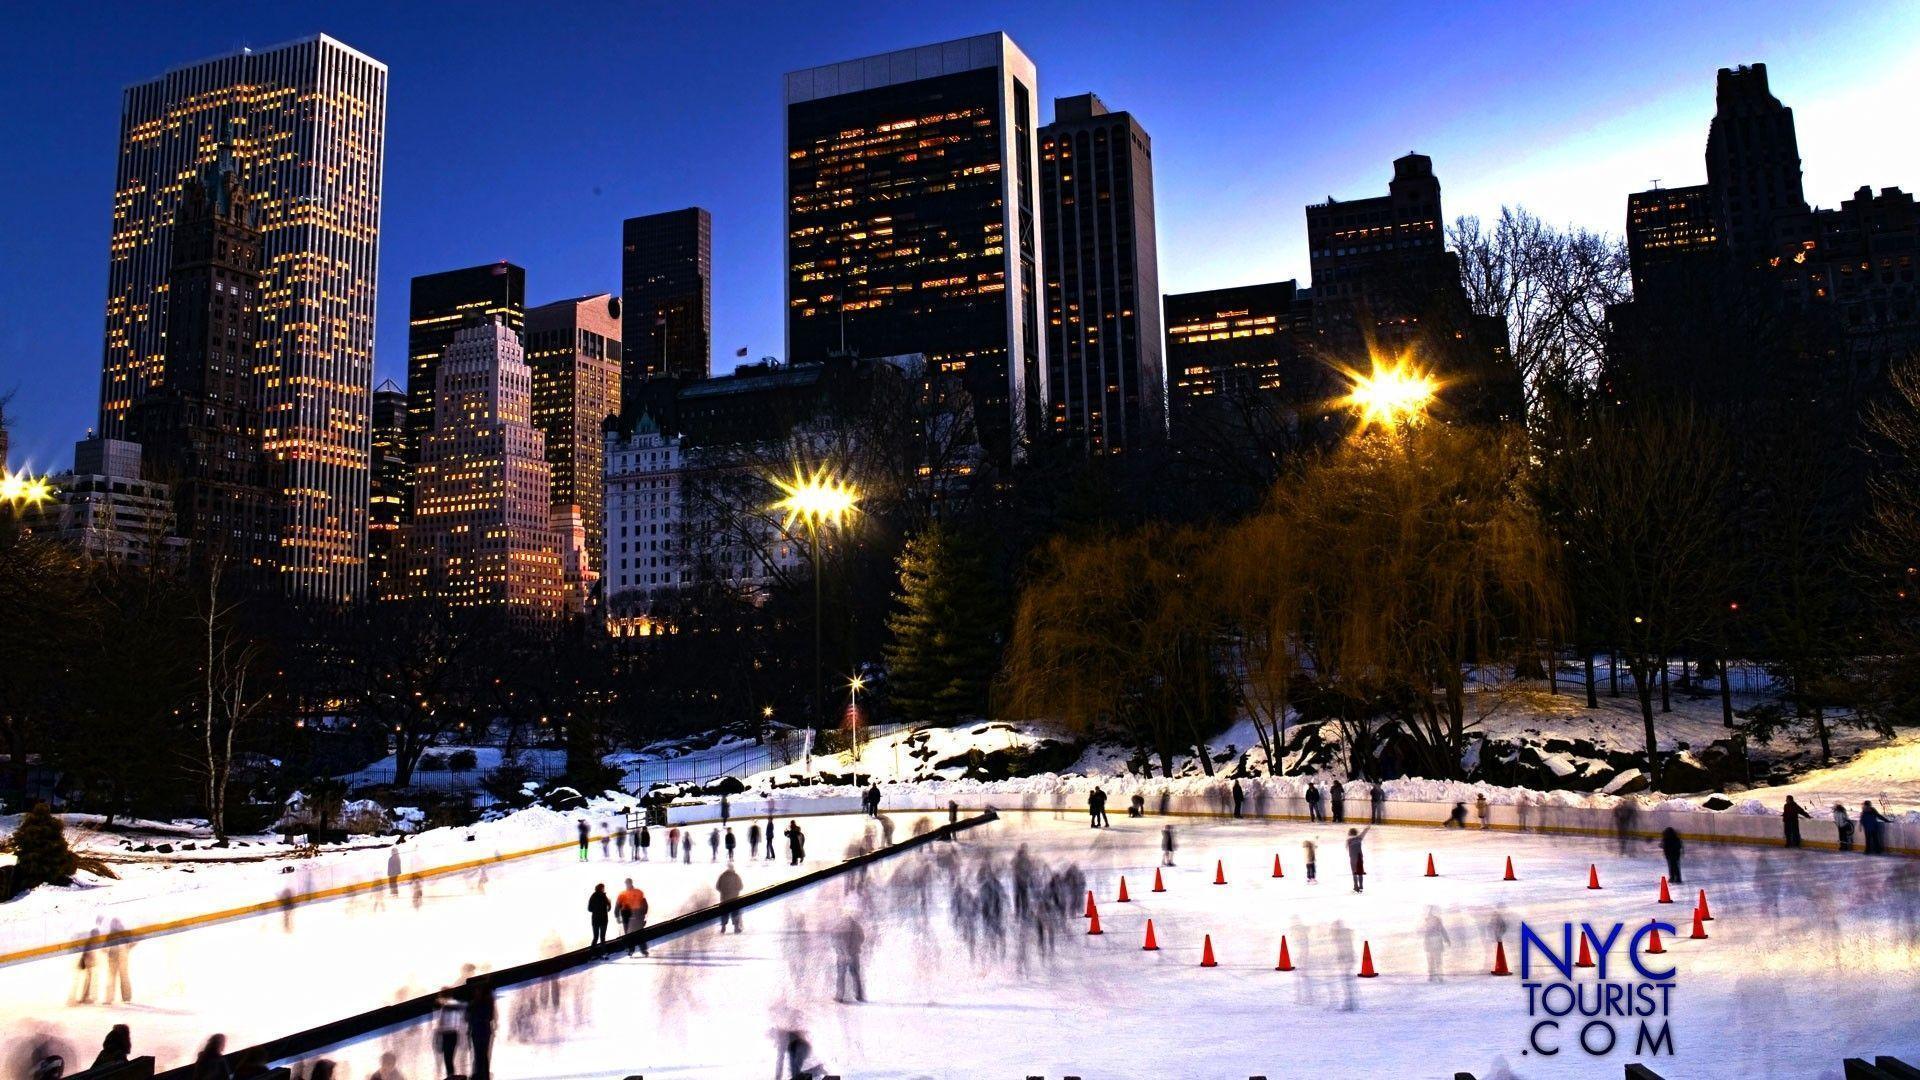 New York City Wallpaper Winter Winter City Wallpapers...